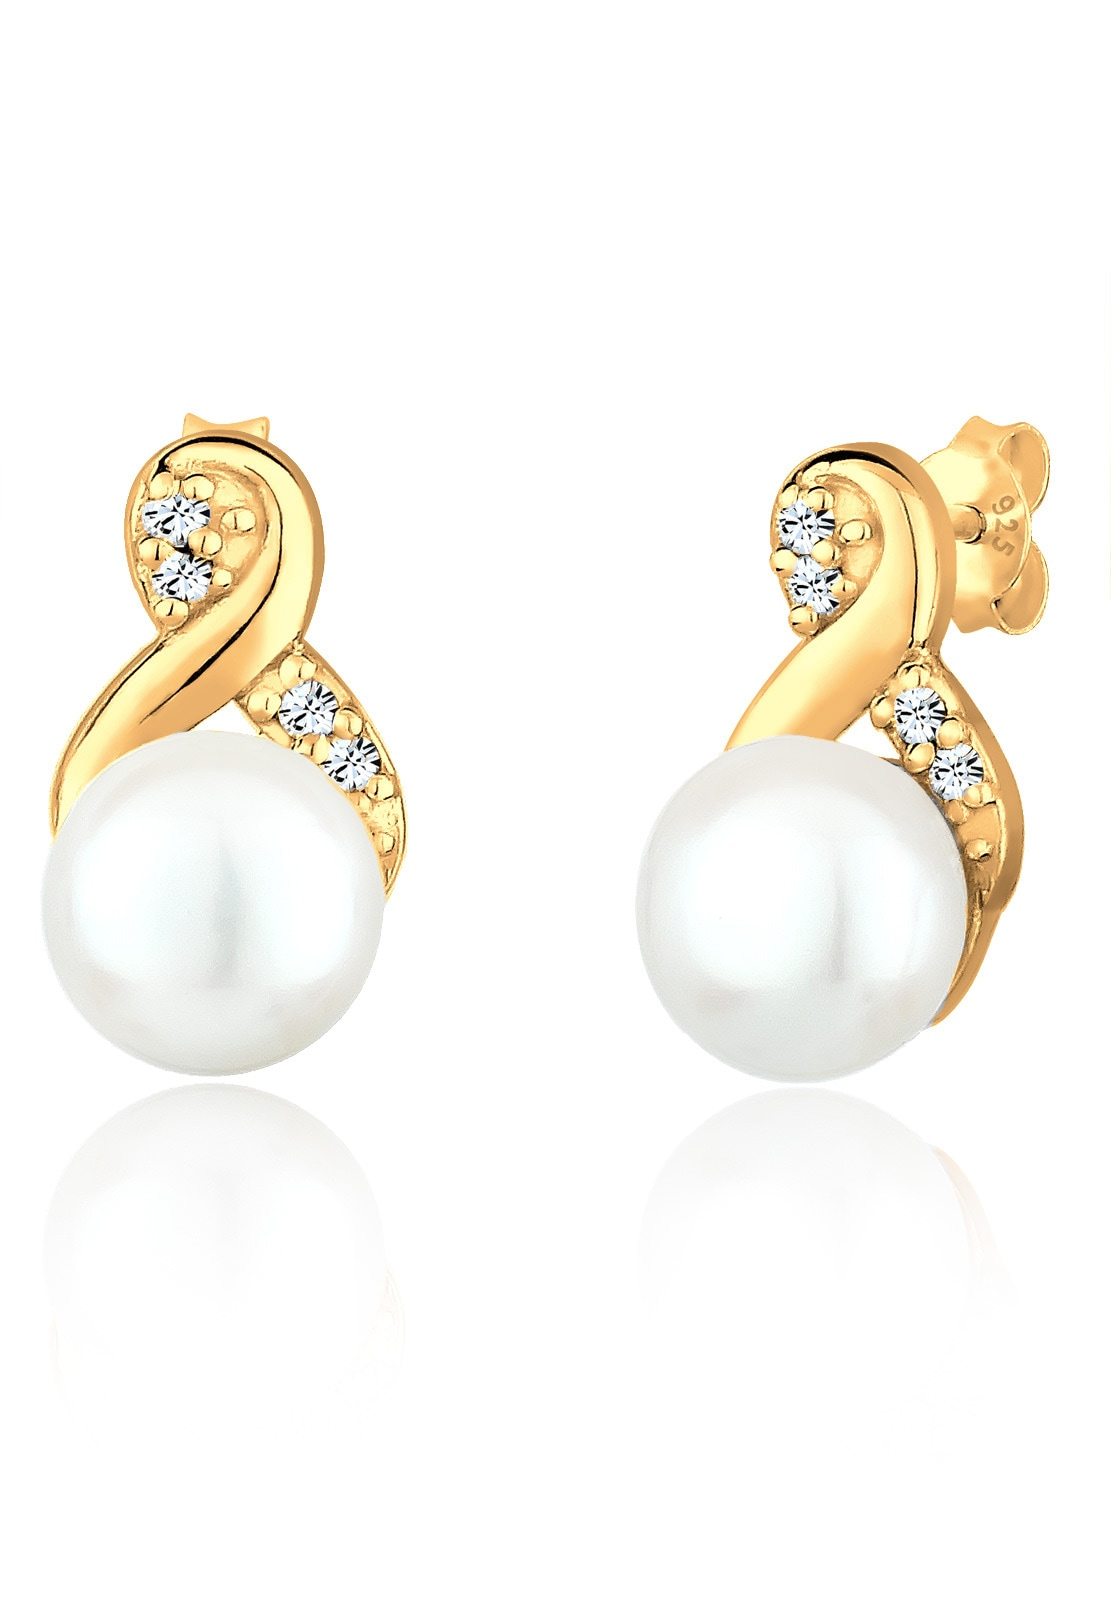 PERLU Paar Ohrstecker Infinity Perle Swarovski Kristalle 925 Silber | Schmuck > Ohrschmuck & Ohrringe > Ohrstecker | Goldfarben | Perlu